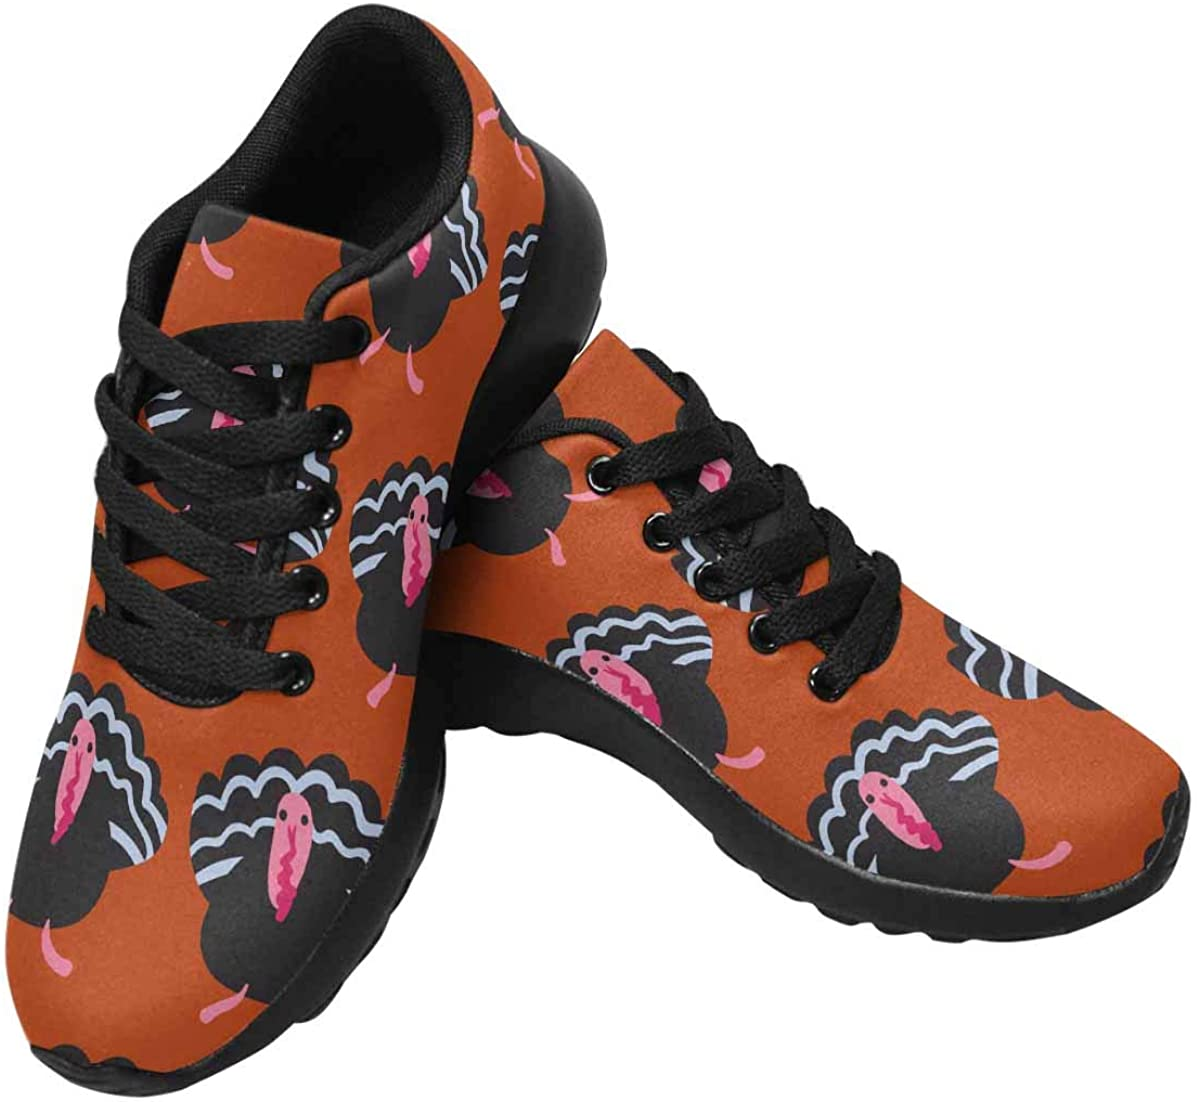 InterestPrint Women's Running Shoes Lightweight Non-Slip Breathable Walking Shoes (US6-US15)